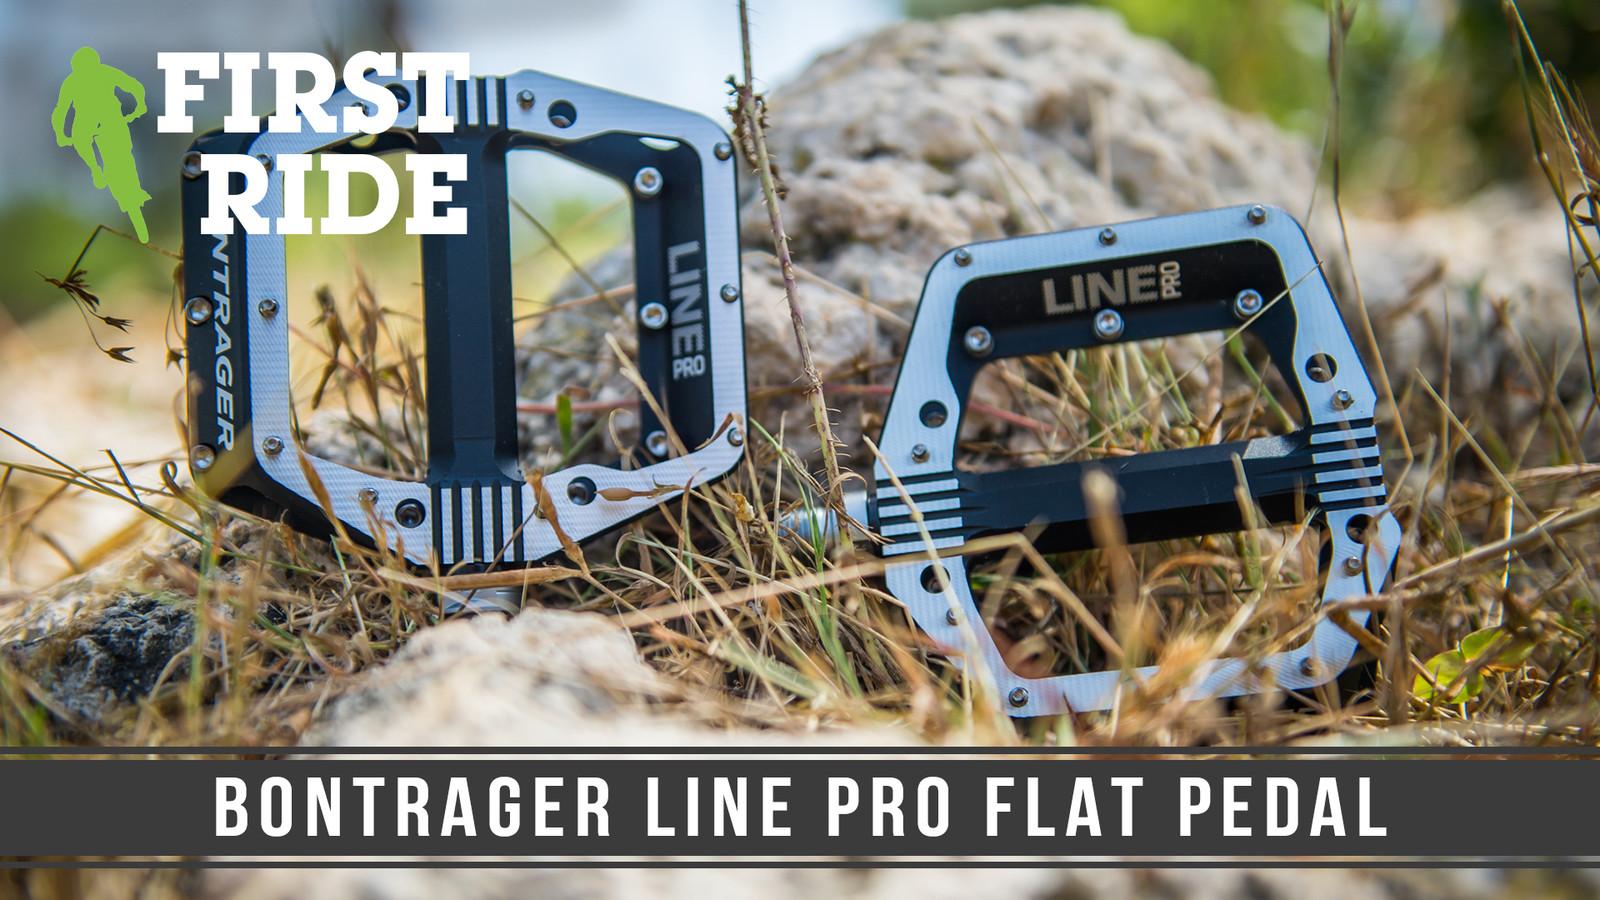 First Ride: Bontrager Line Pro Flat Pedal